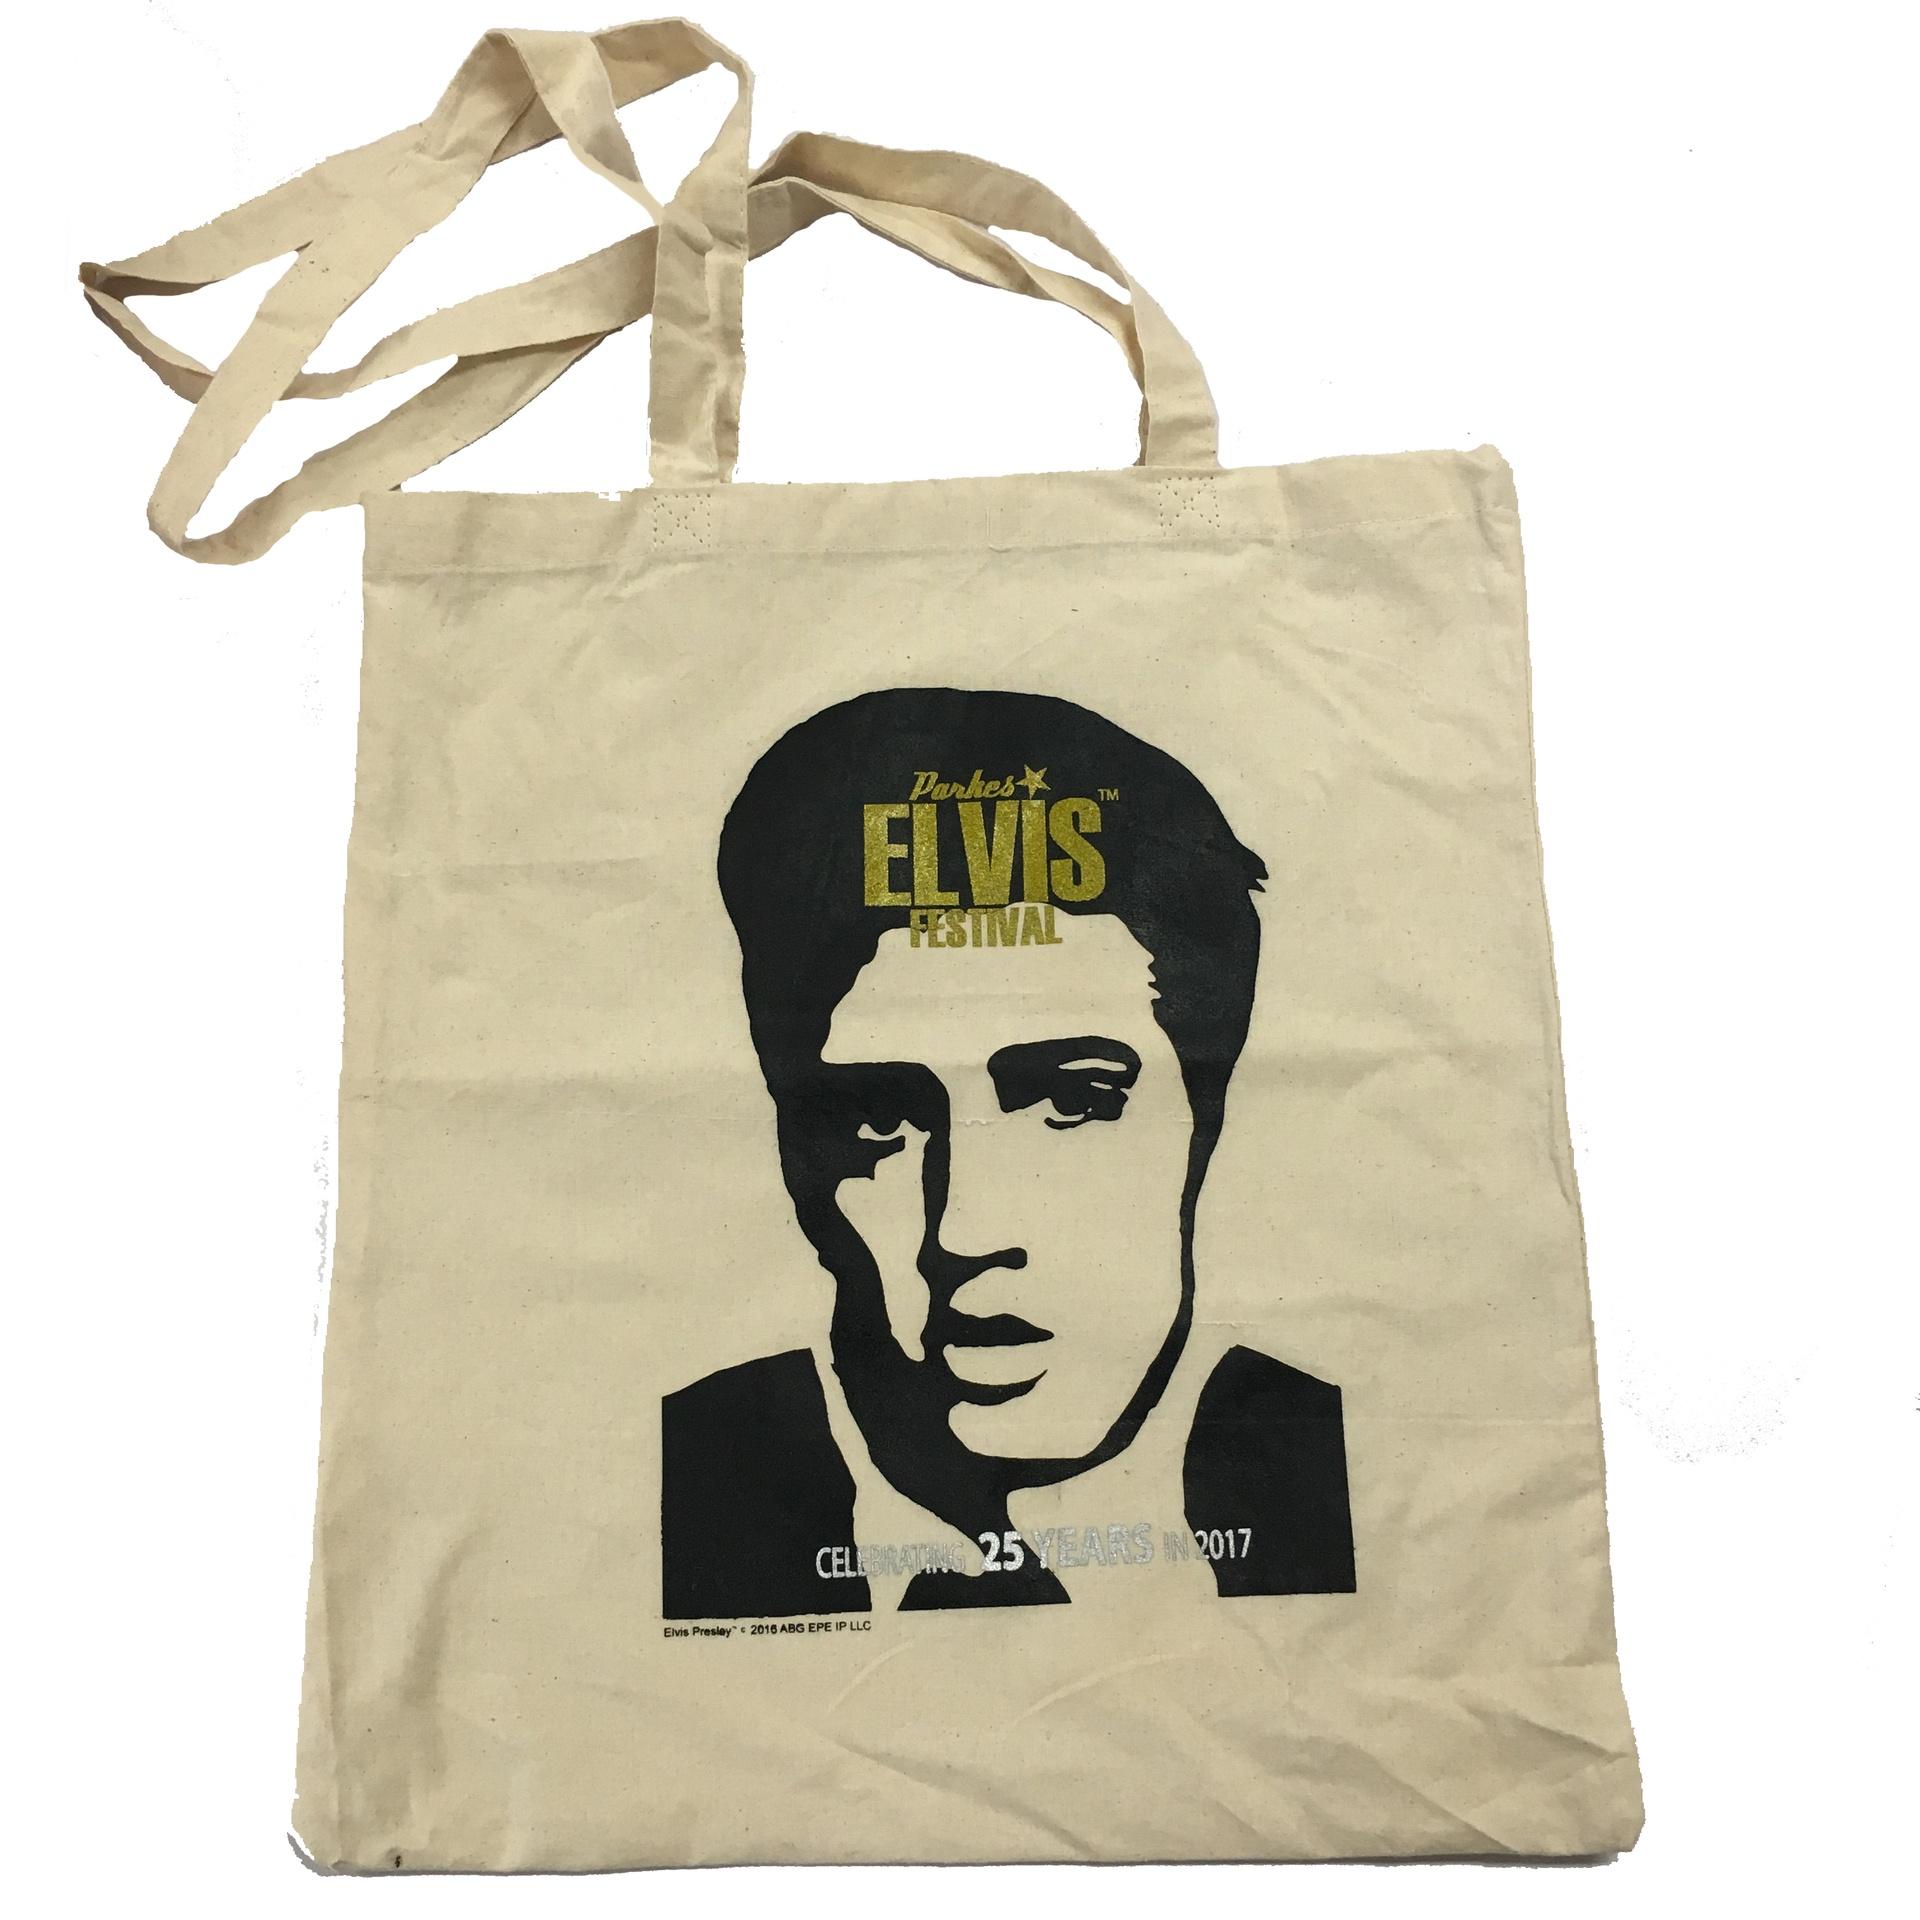 Calico Tote Bag